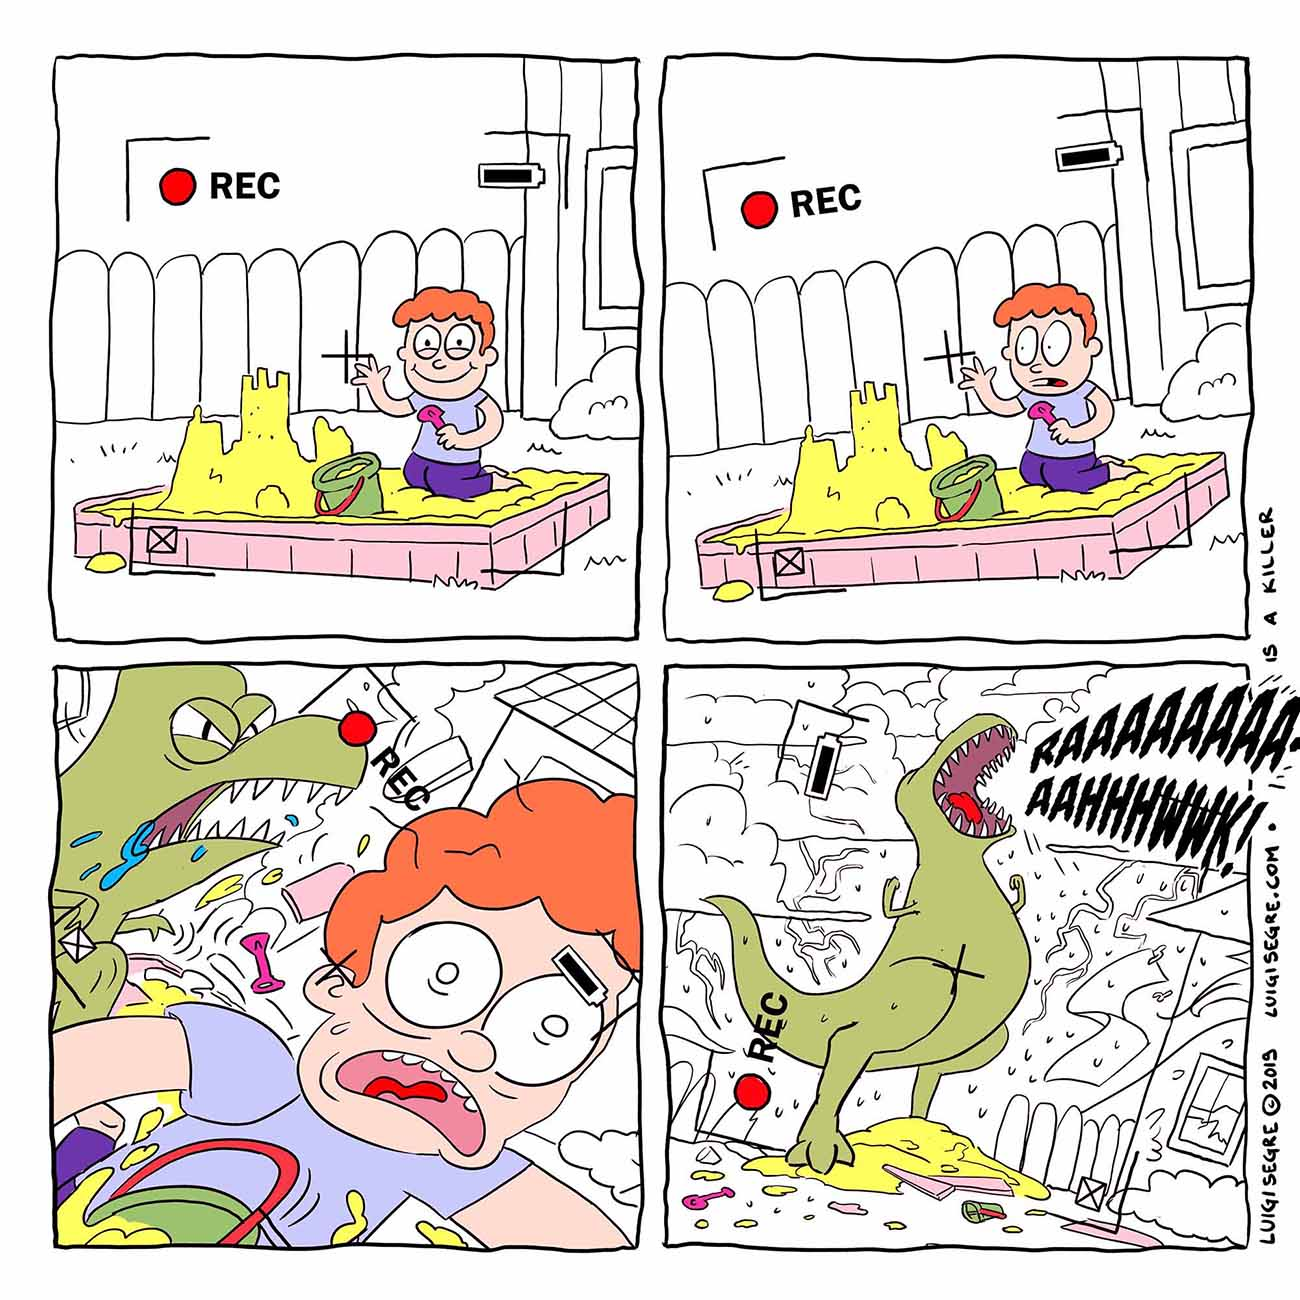 Contenuti_Low_Res_Luigi_Segre_Cartoons_2019_my_friend_is_a_killer_12.jpg